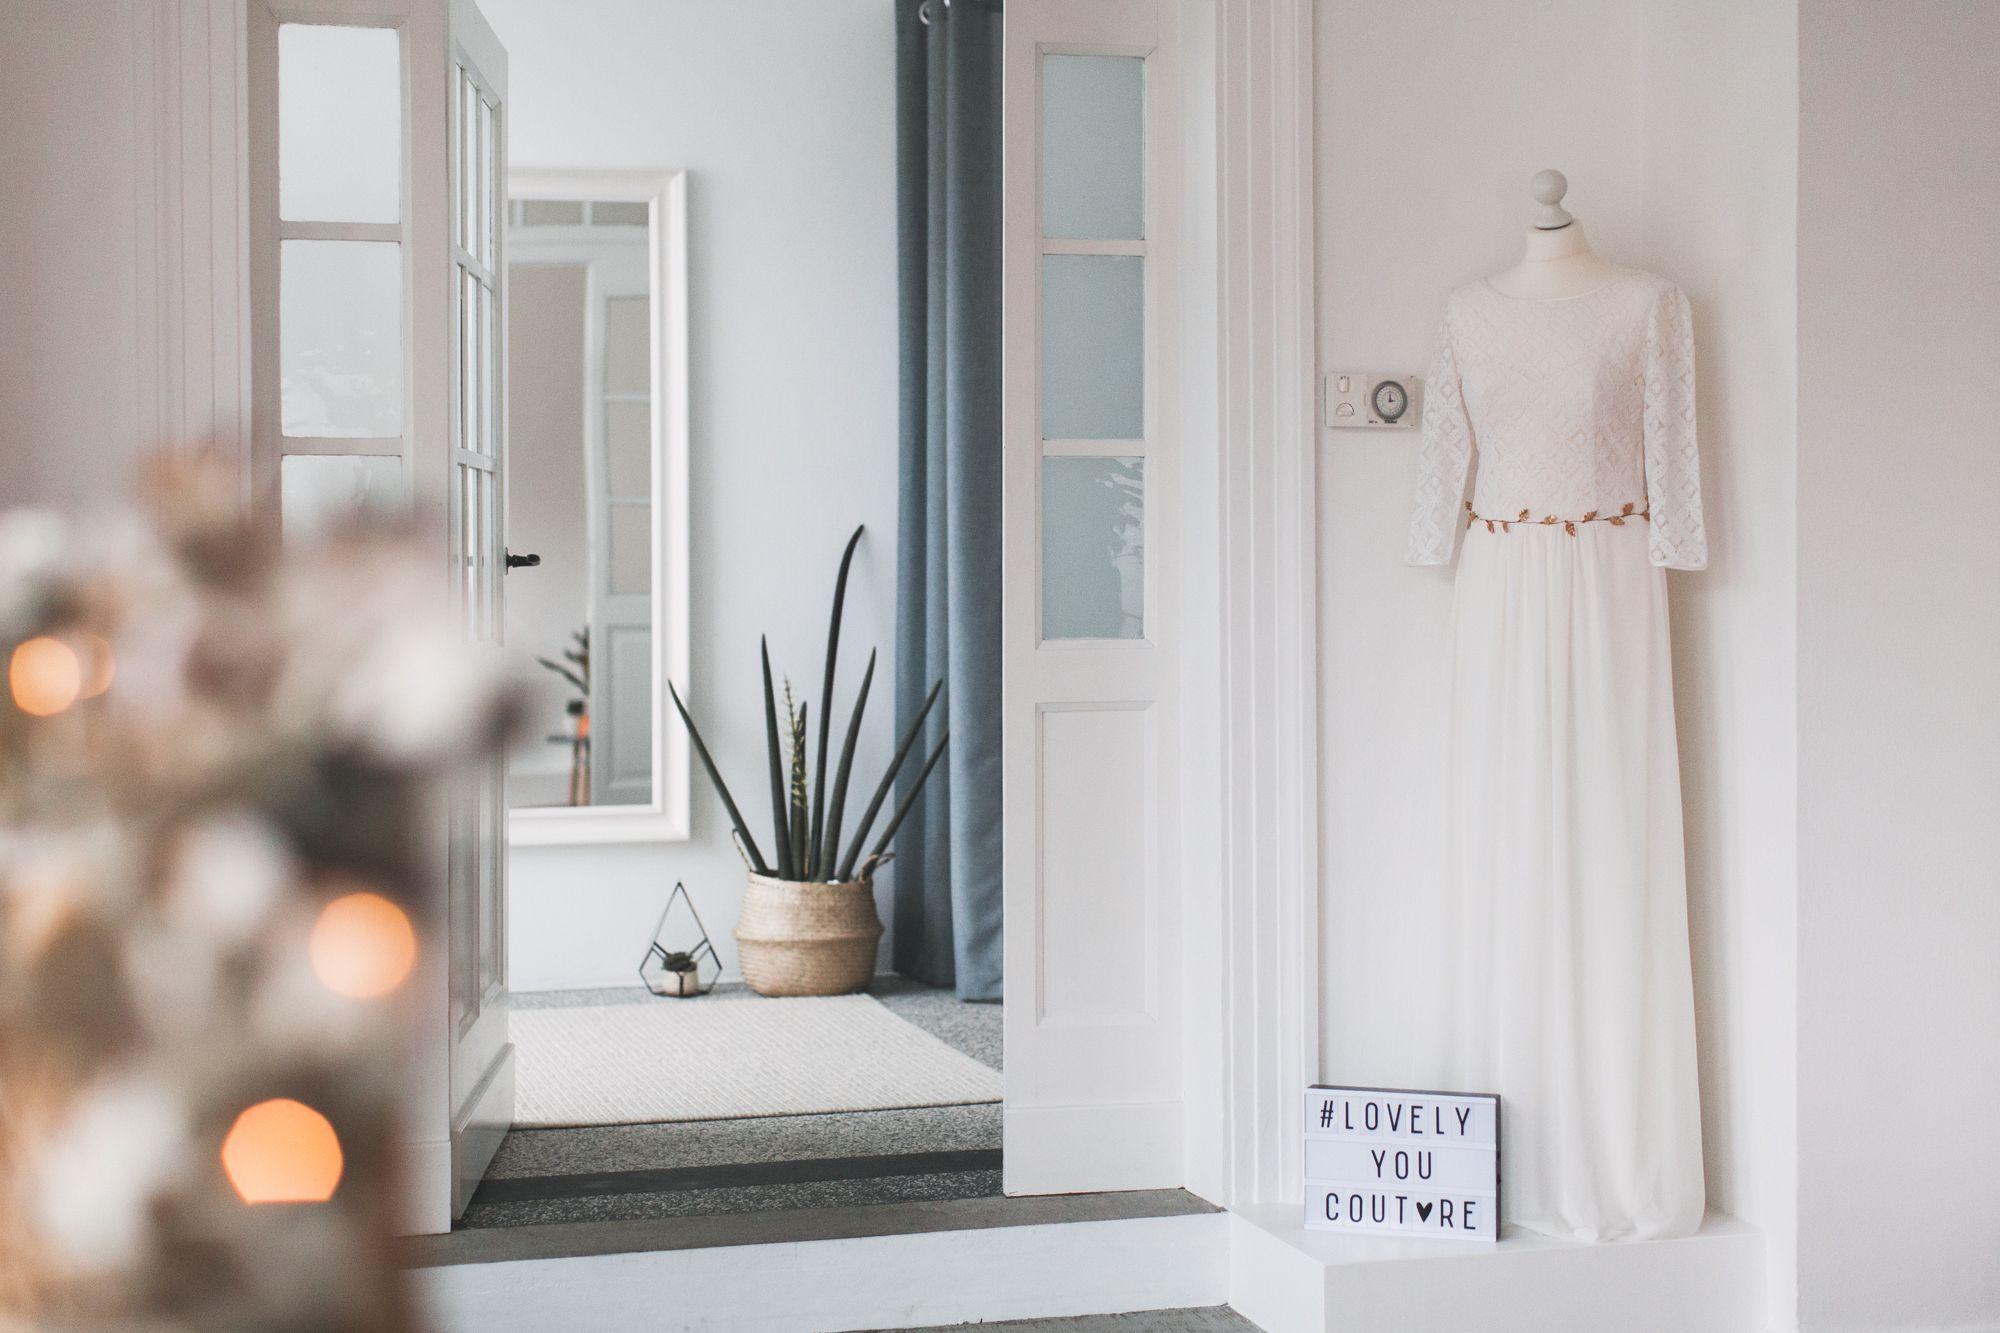 Brautmodenladen Bielefeld Munster Brautmodengeschaft Hannover